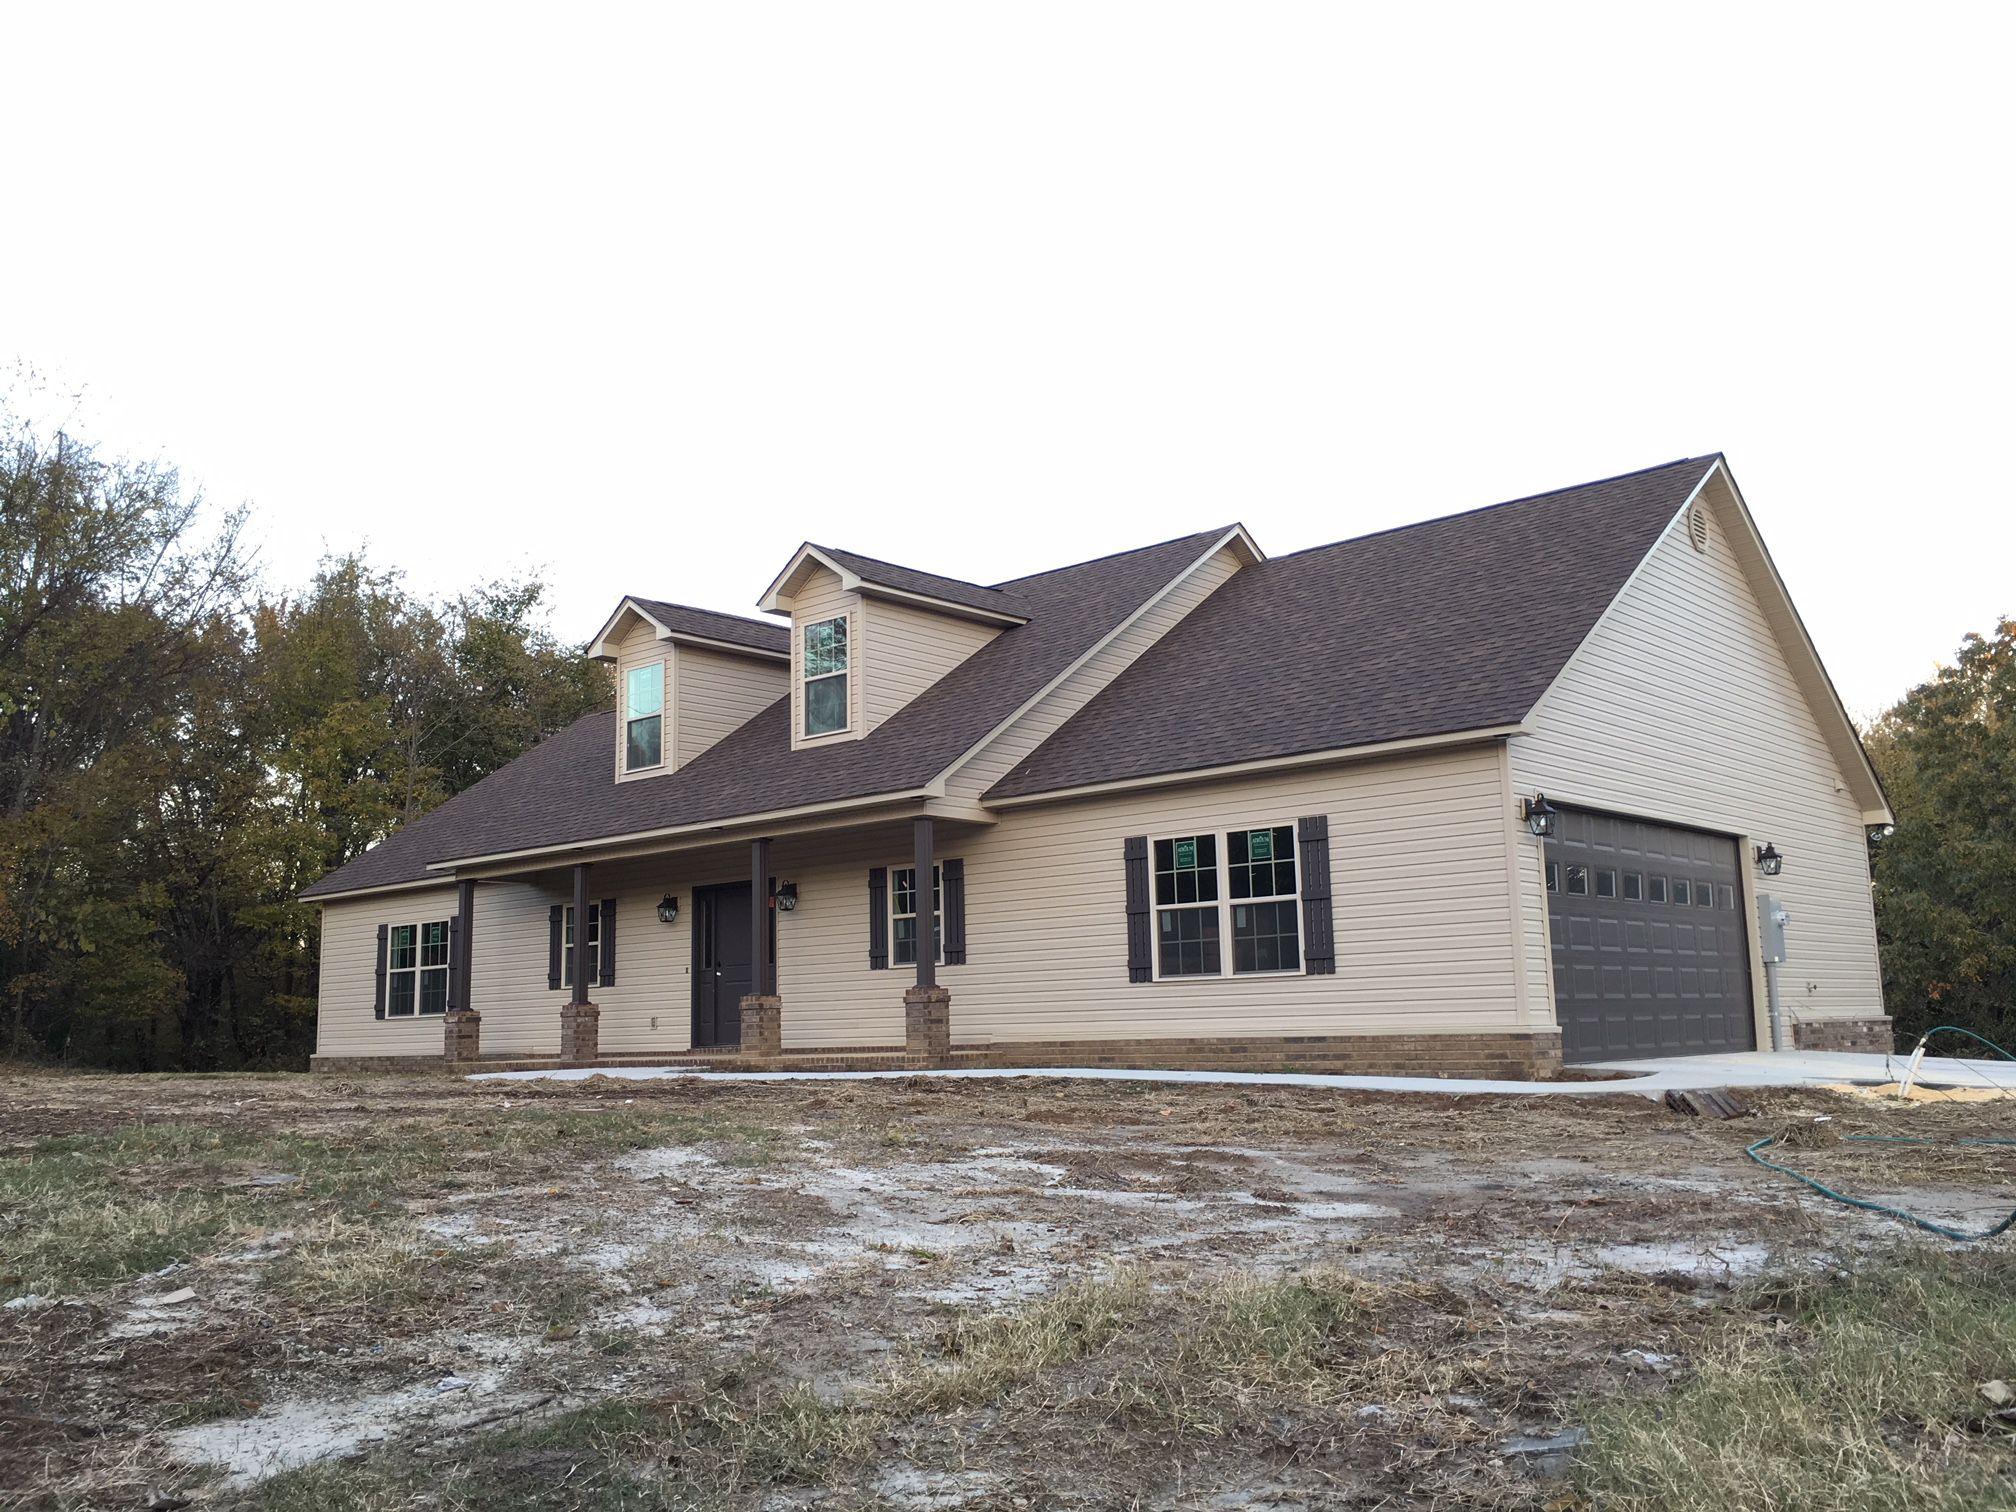 Dyersburg Topix Foreclosures Wwwtollebildcom